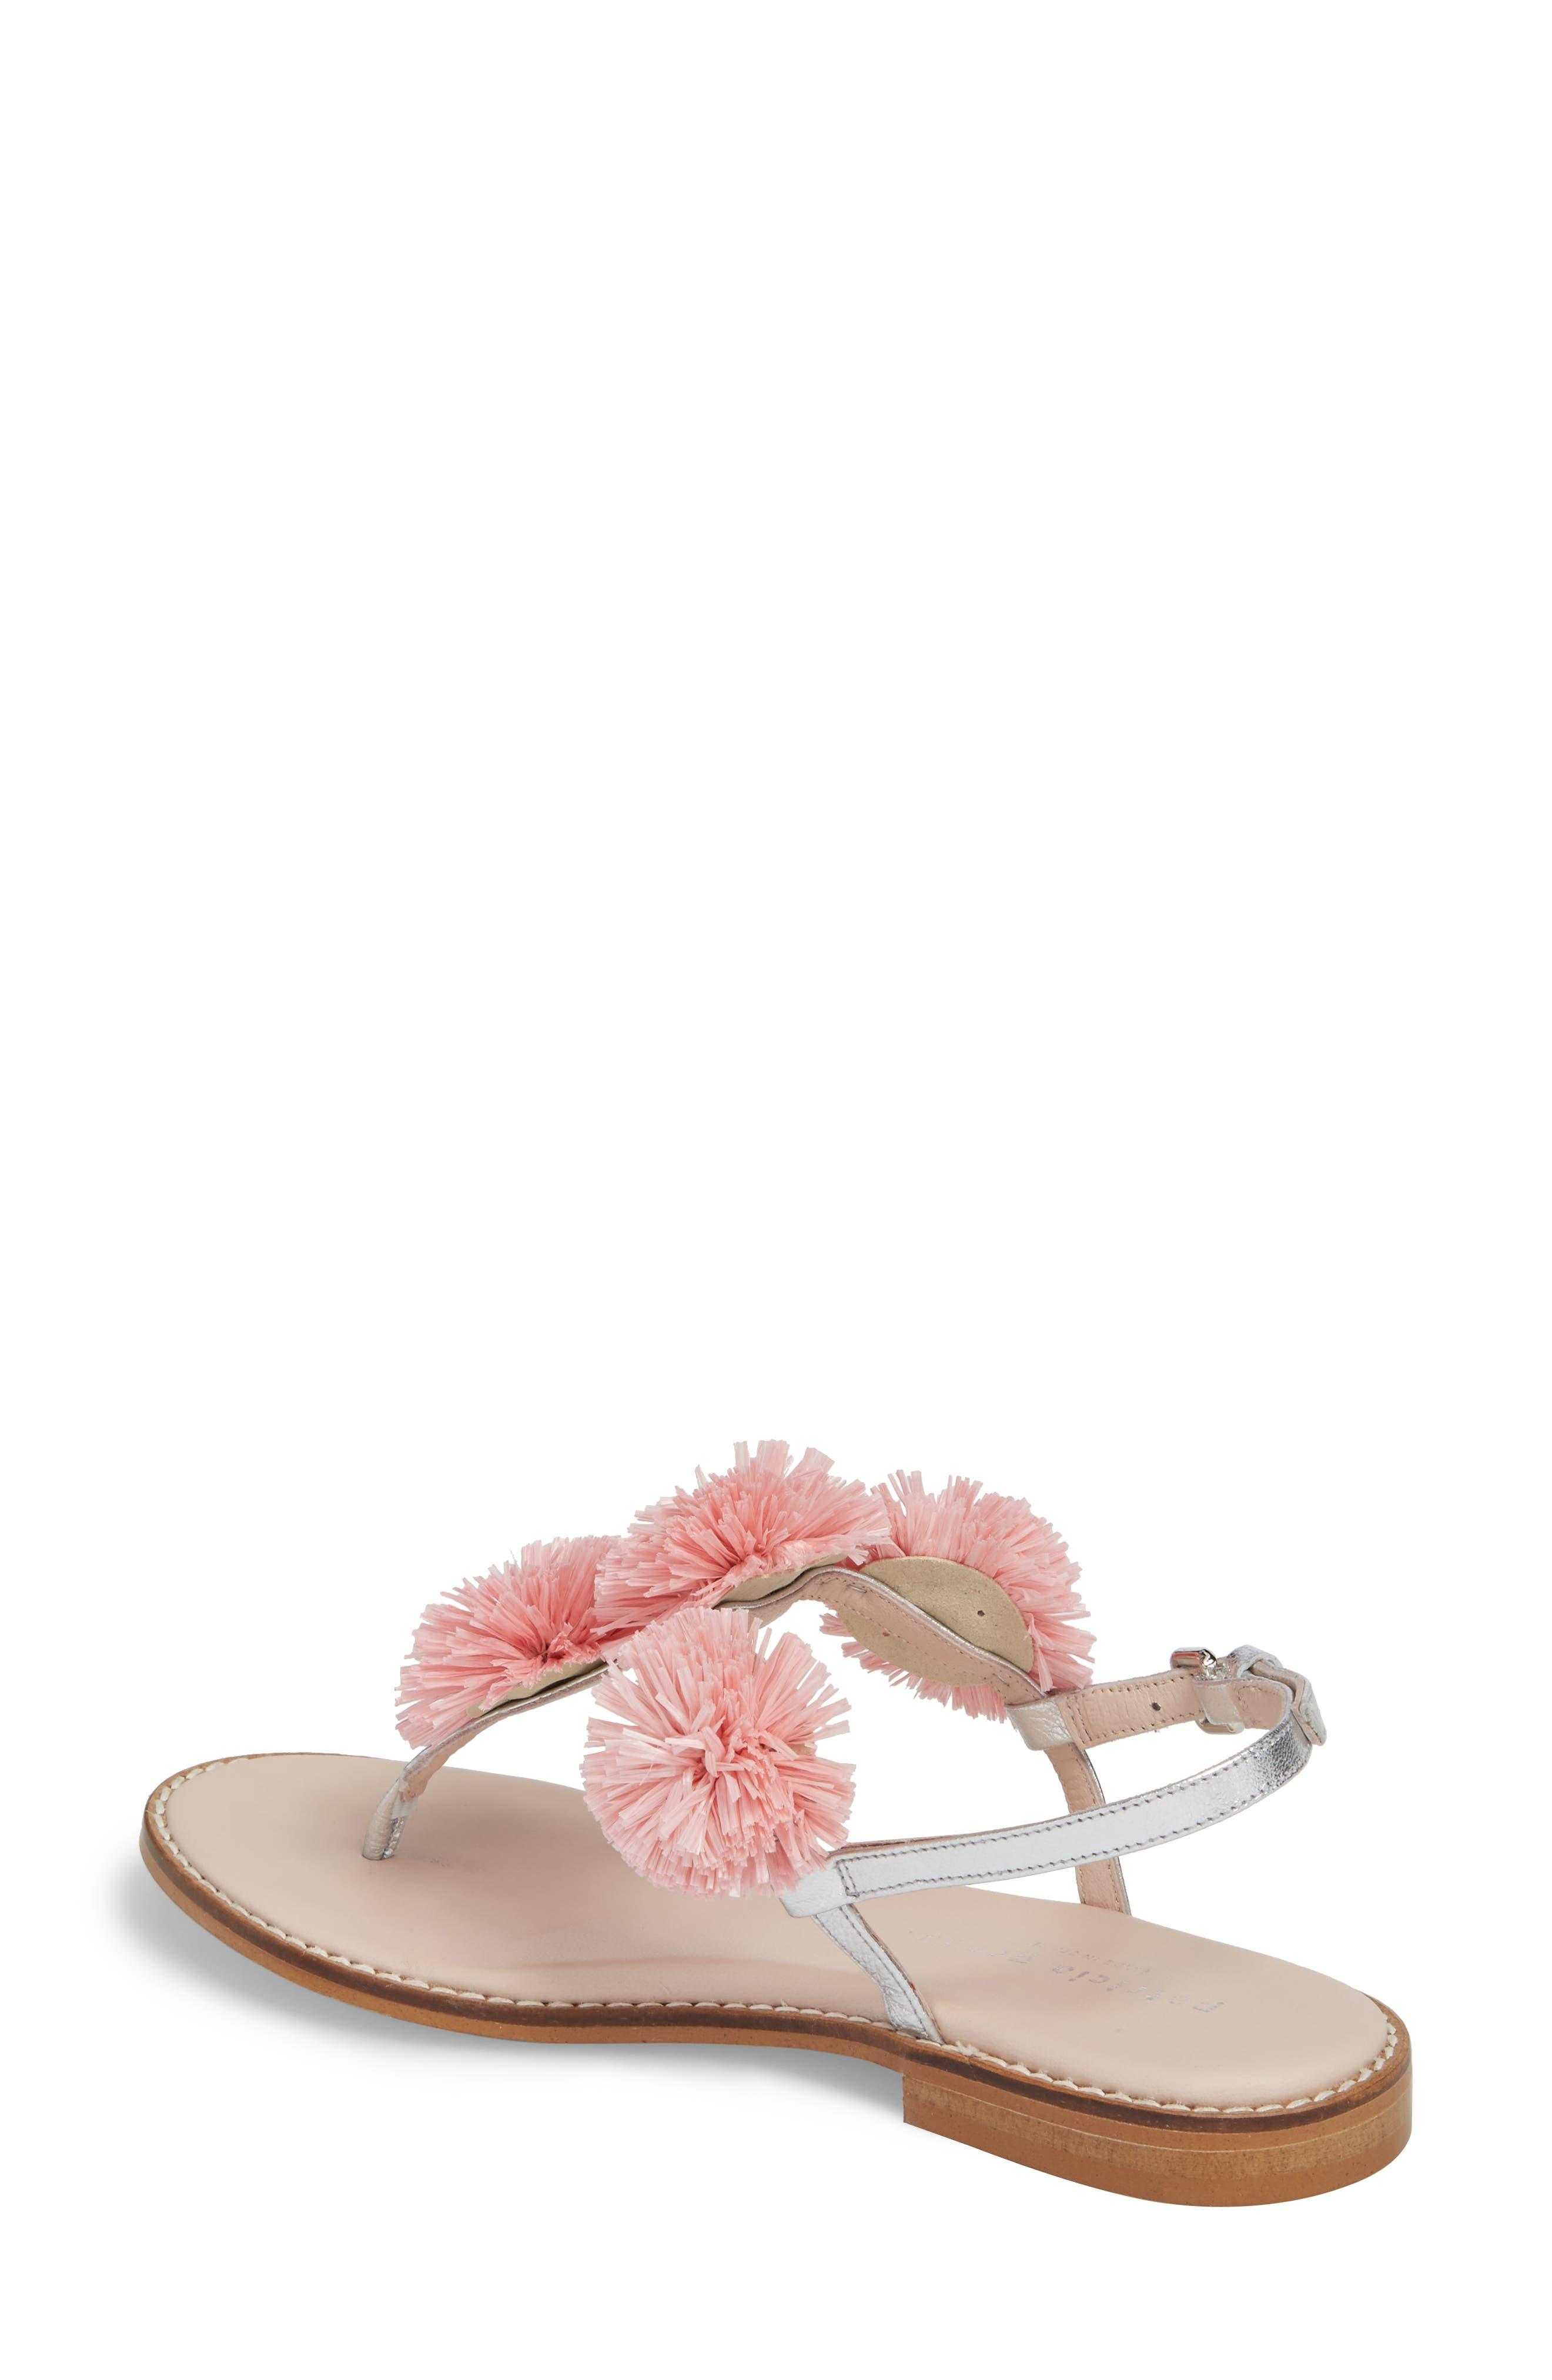 Pompom Thong Sandal,                             Alternate thumbnail 2, color,                             Pink Leather